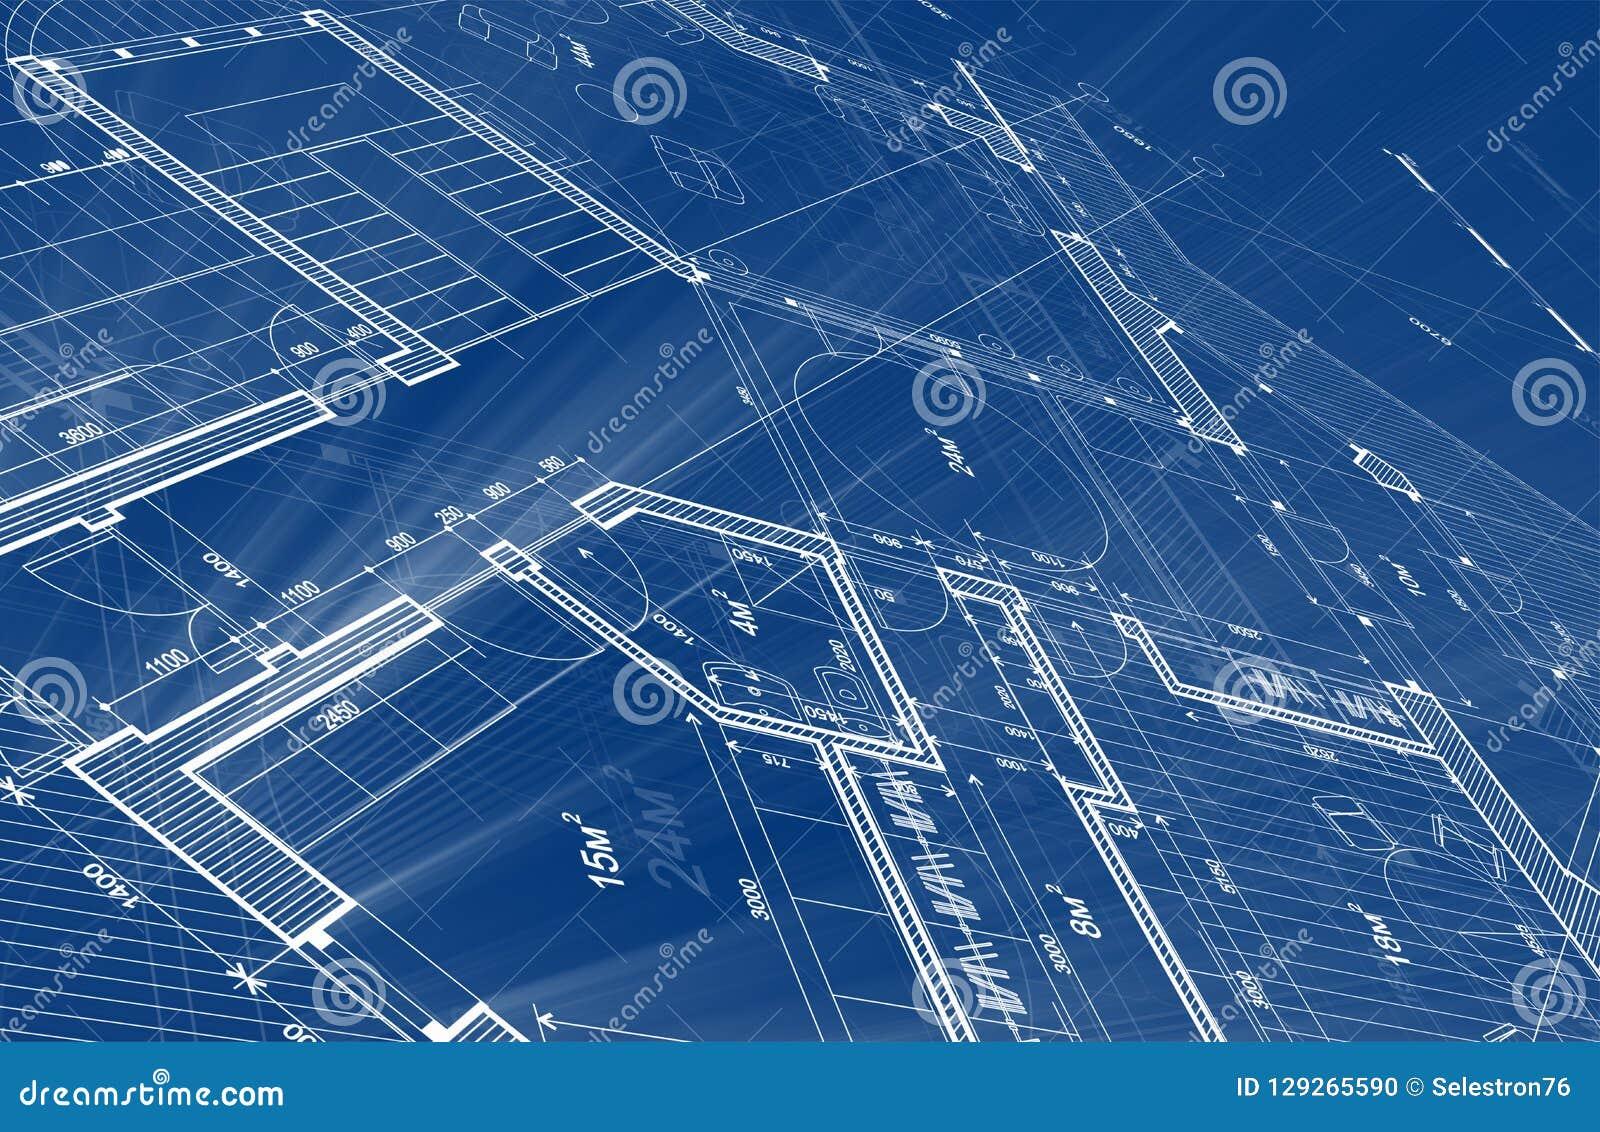 Architecture design: blueprint plan - illustration of a plan